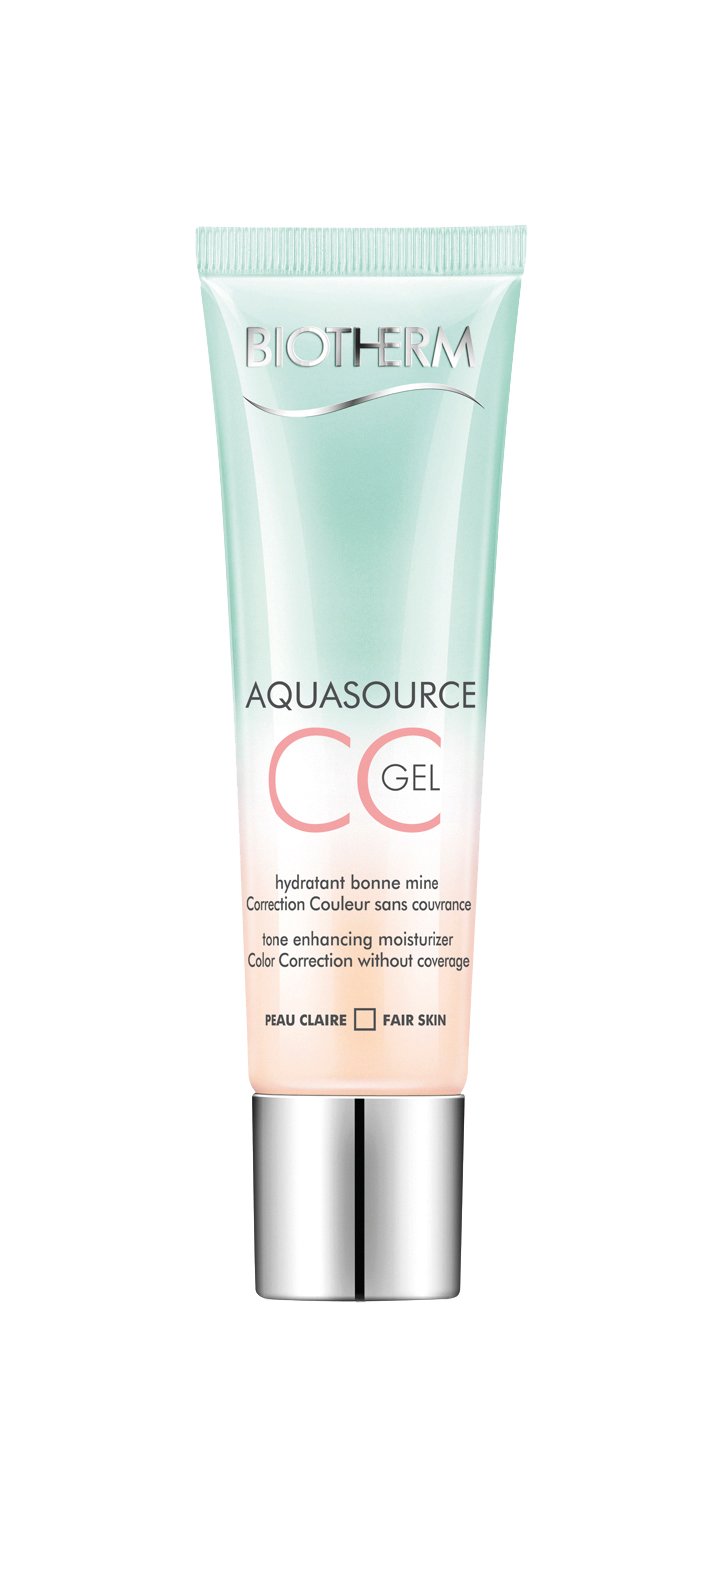 huid8-biotherm_aquasource_cc_gel_03